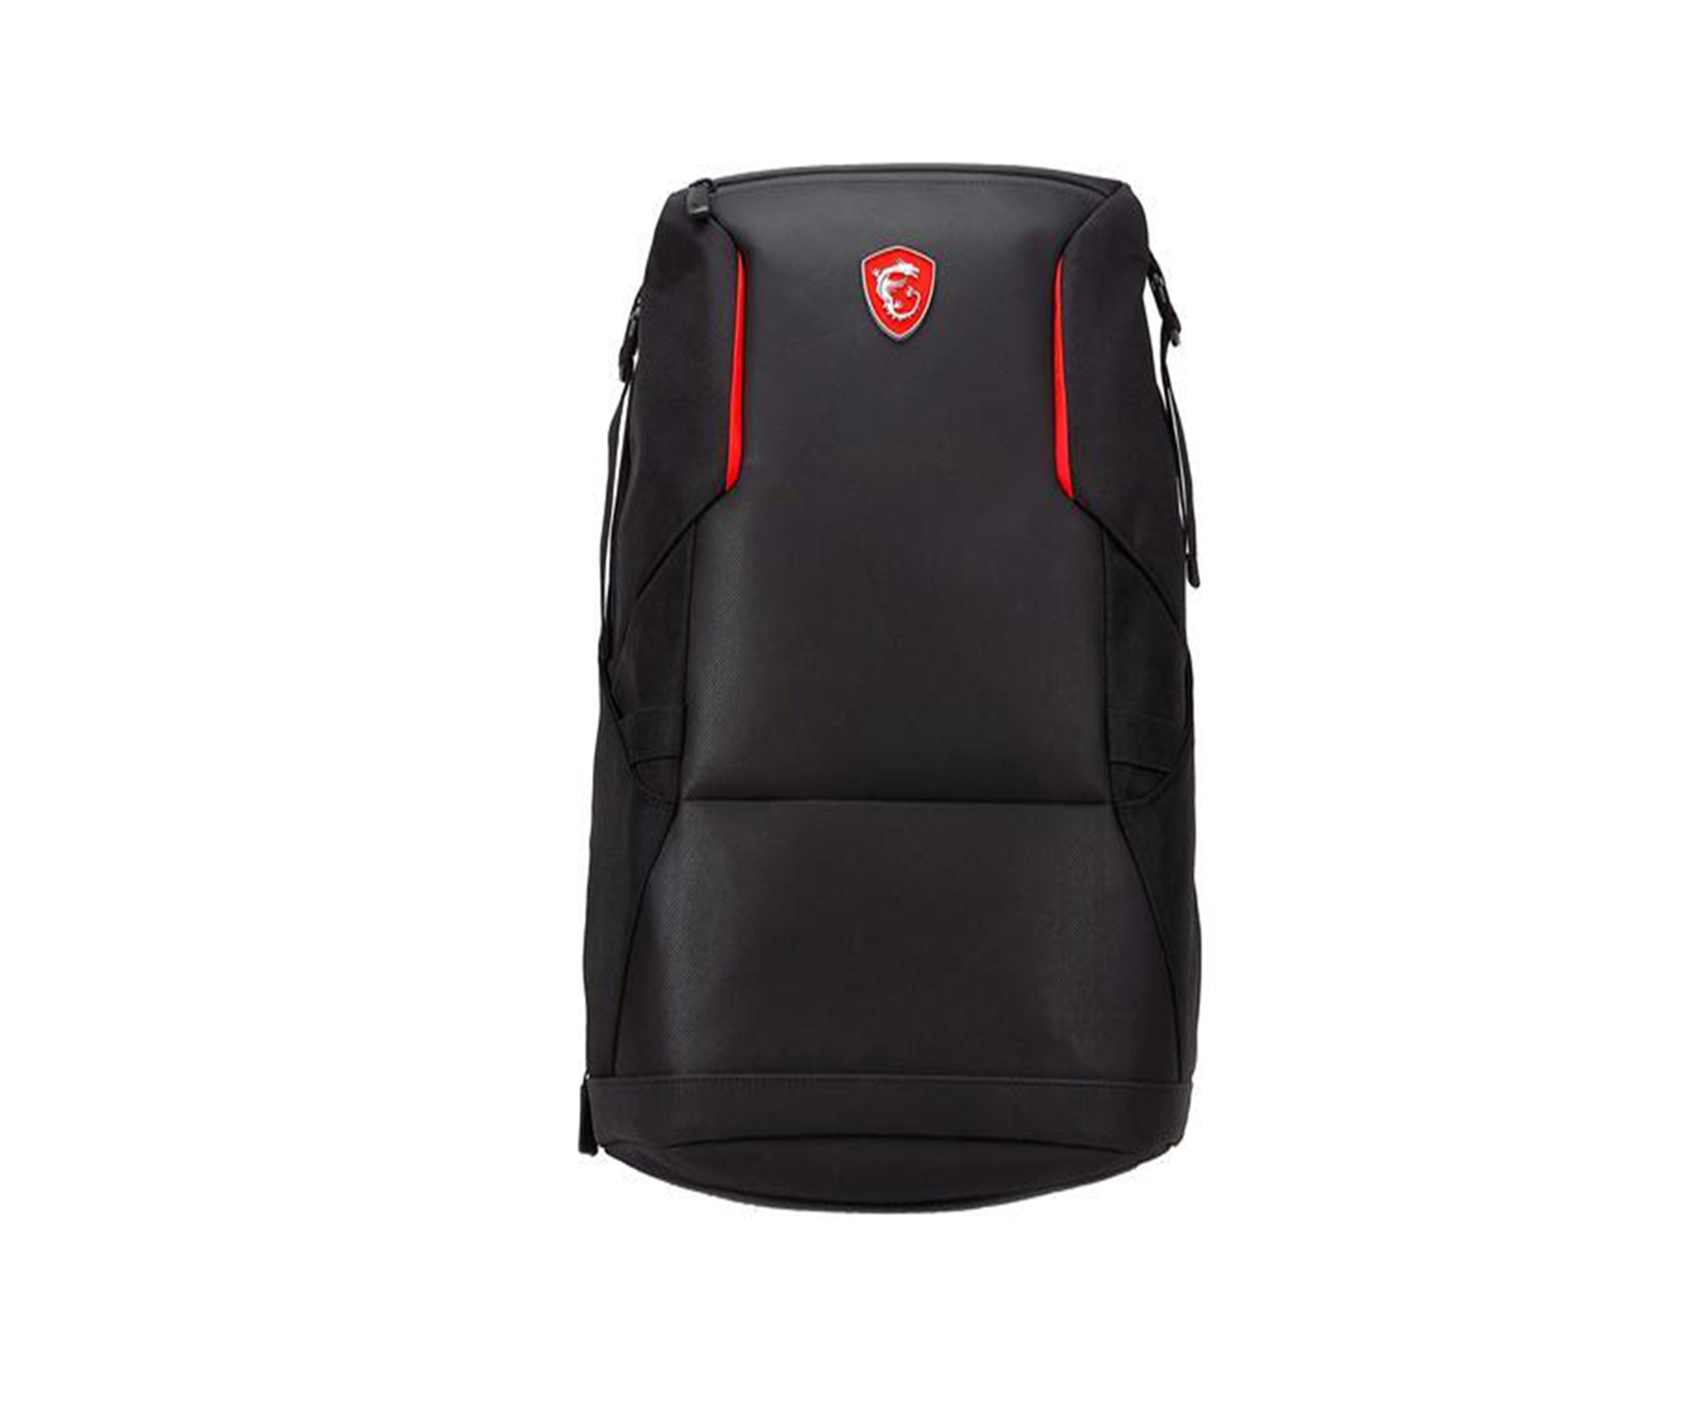 MSIB1 G34-N1XXX13-808 Urban Raider Backpack, Black